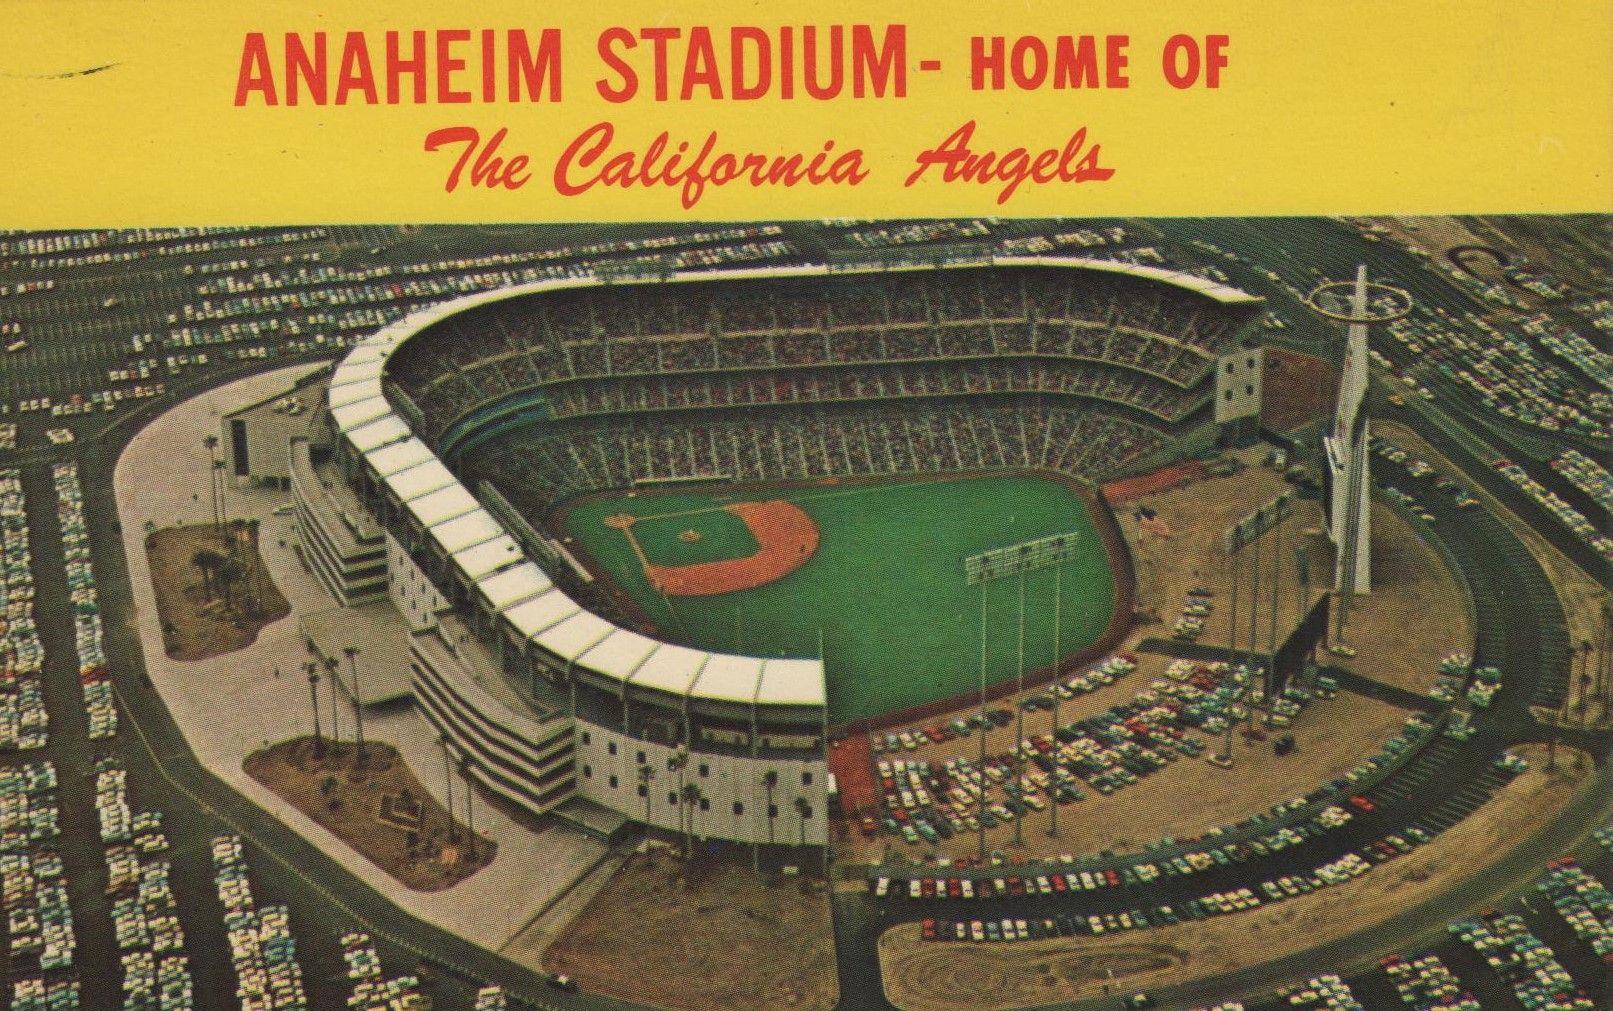 Old postcard. Hagins collection. Anaheim angels baseball